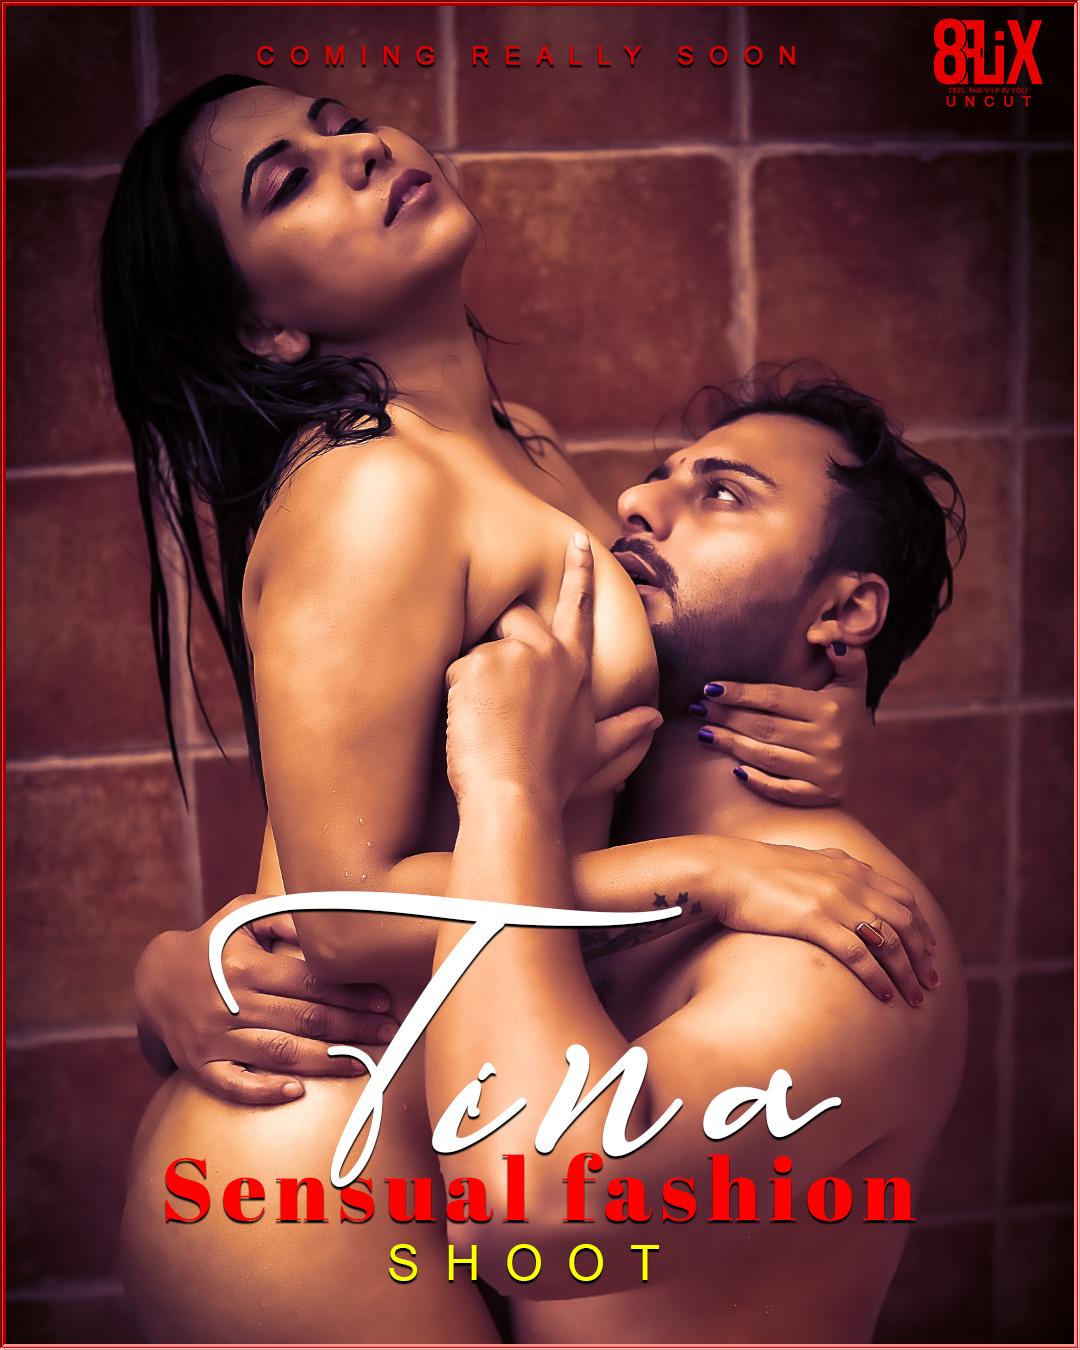 18+ Tina Sensual Fashion Shoot 8flix Erotic Short Film Watch Online